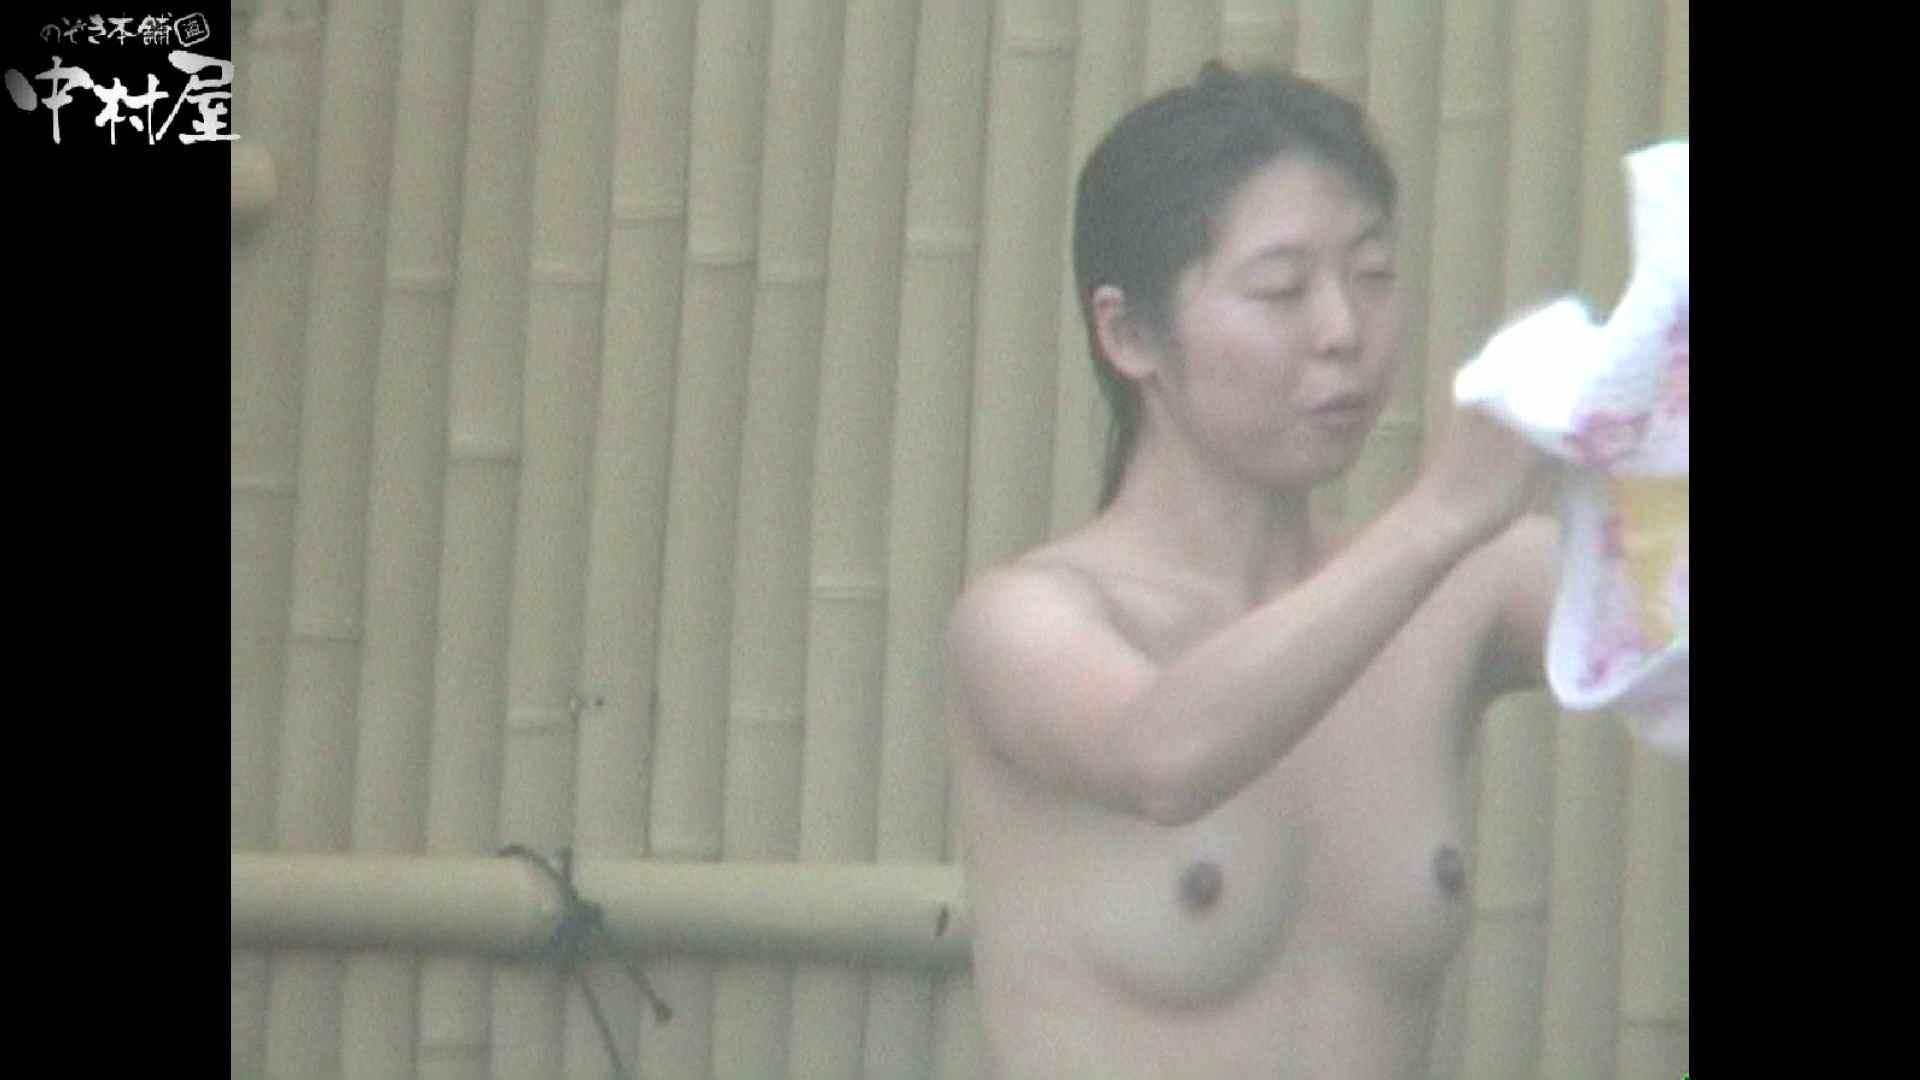 Aquaな露天風呂Vol.932 盗撮師作品  106pic 75